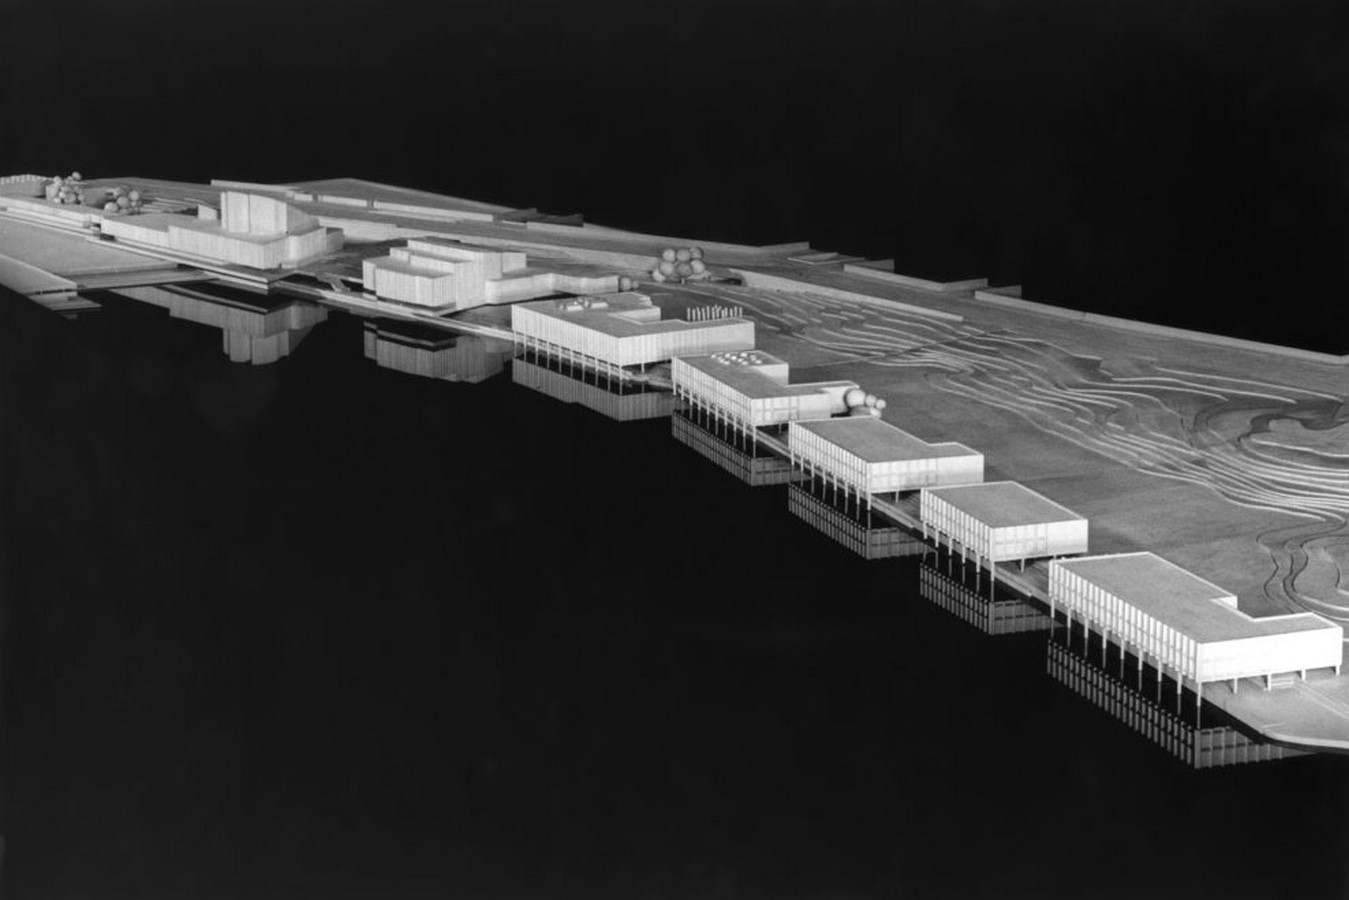 Finlandia Hall by Alvar Aalto: Celebrating Light and Nature - Sheet11